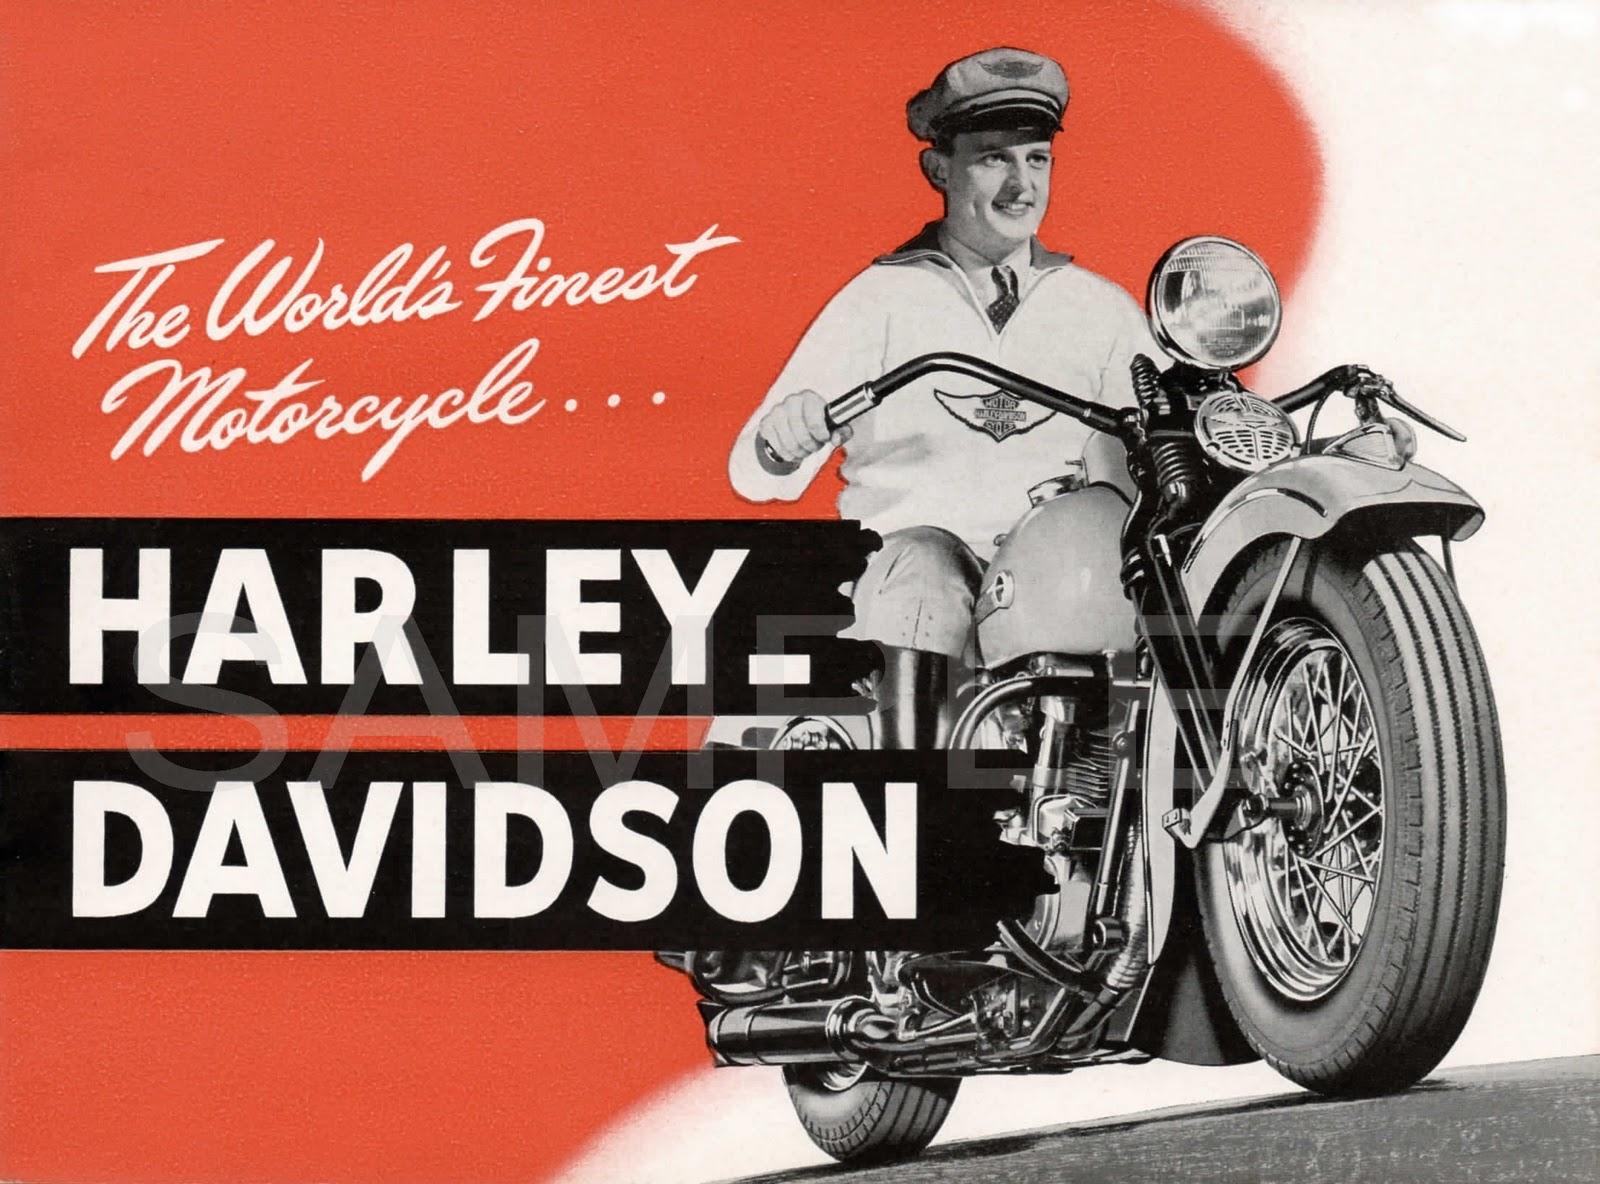 Harley Davidson Advertising: Vintage Motorcycle Advertisements Harley-Davidson Indian